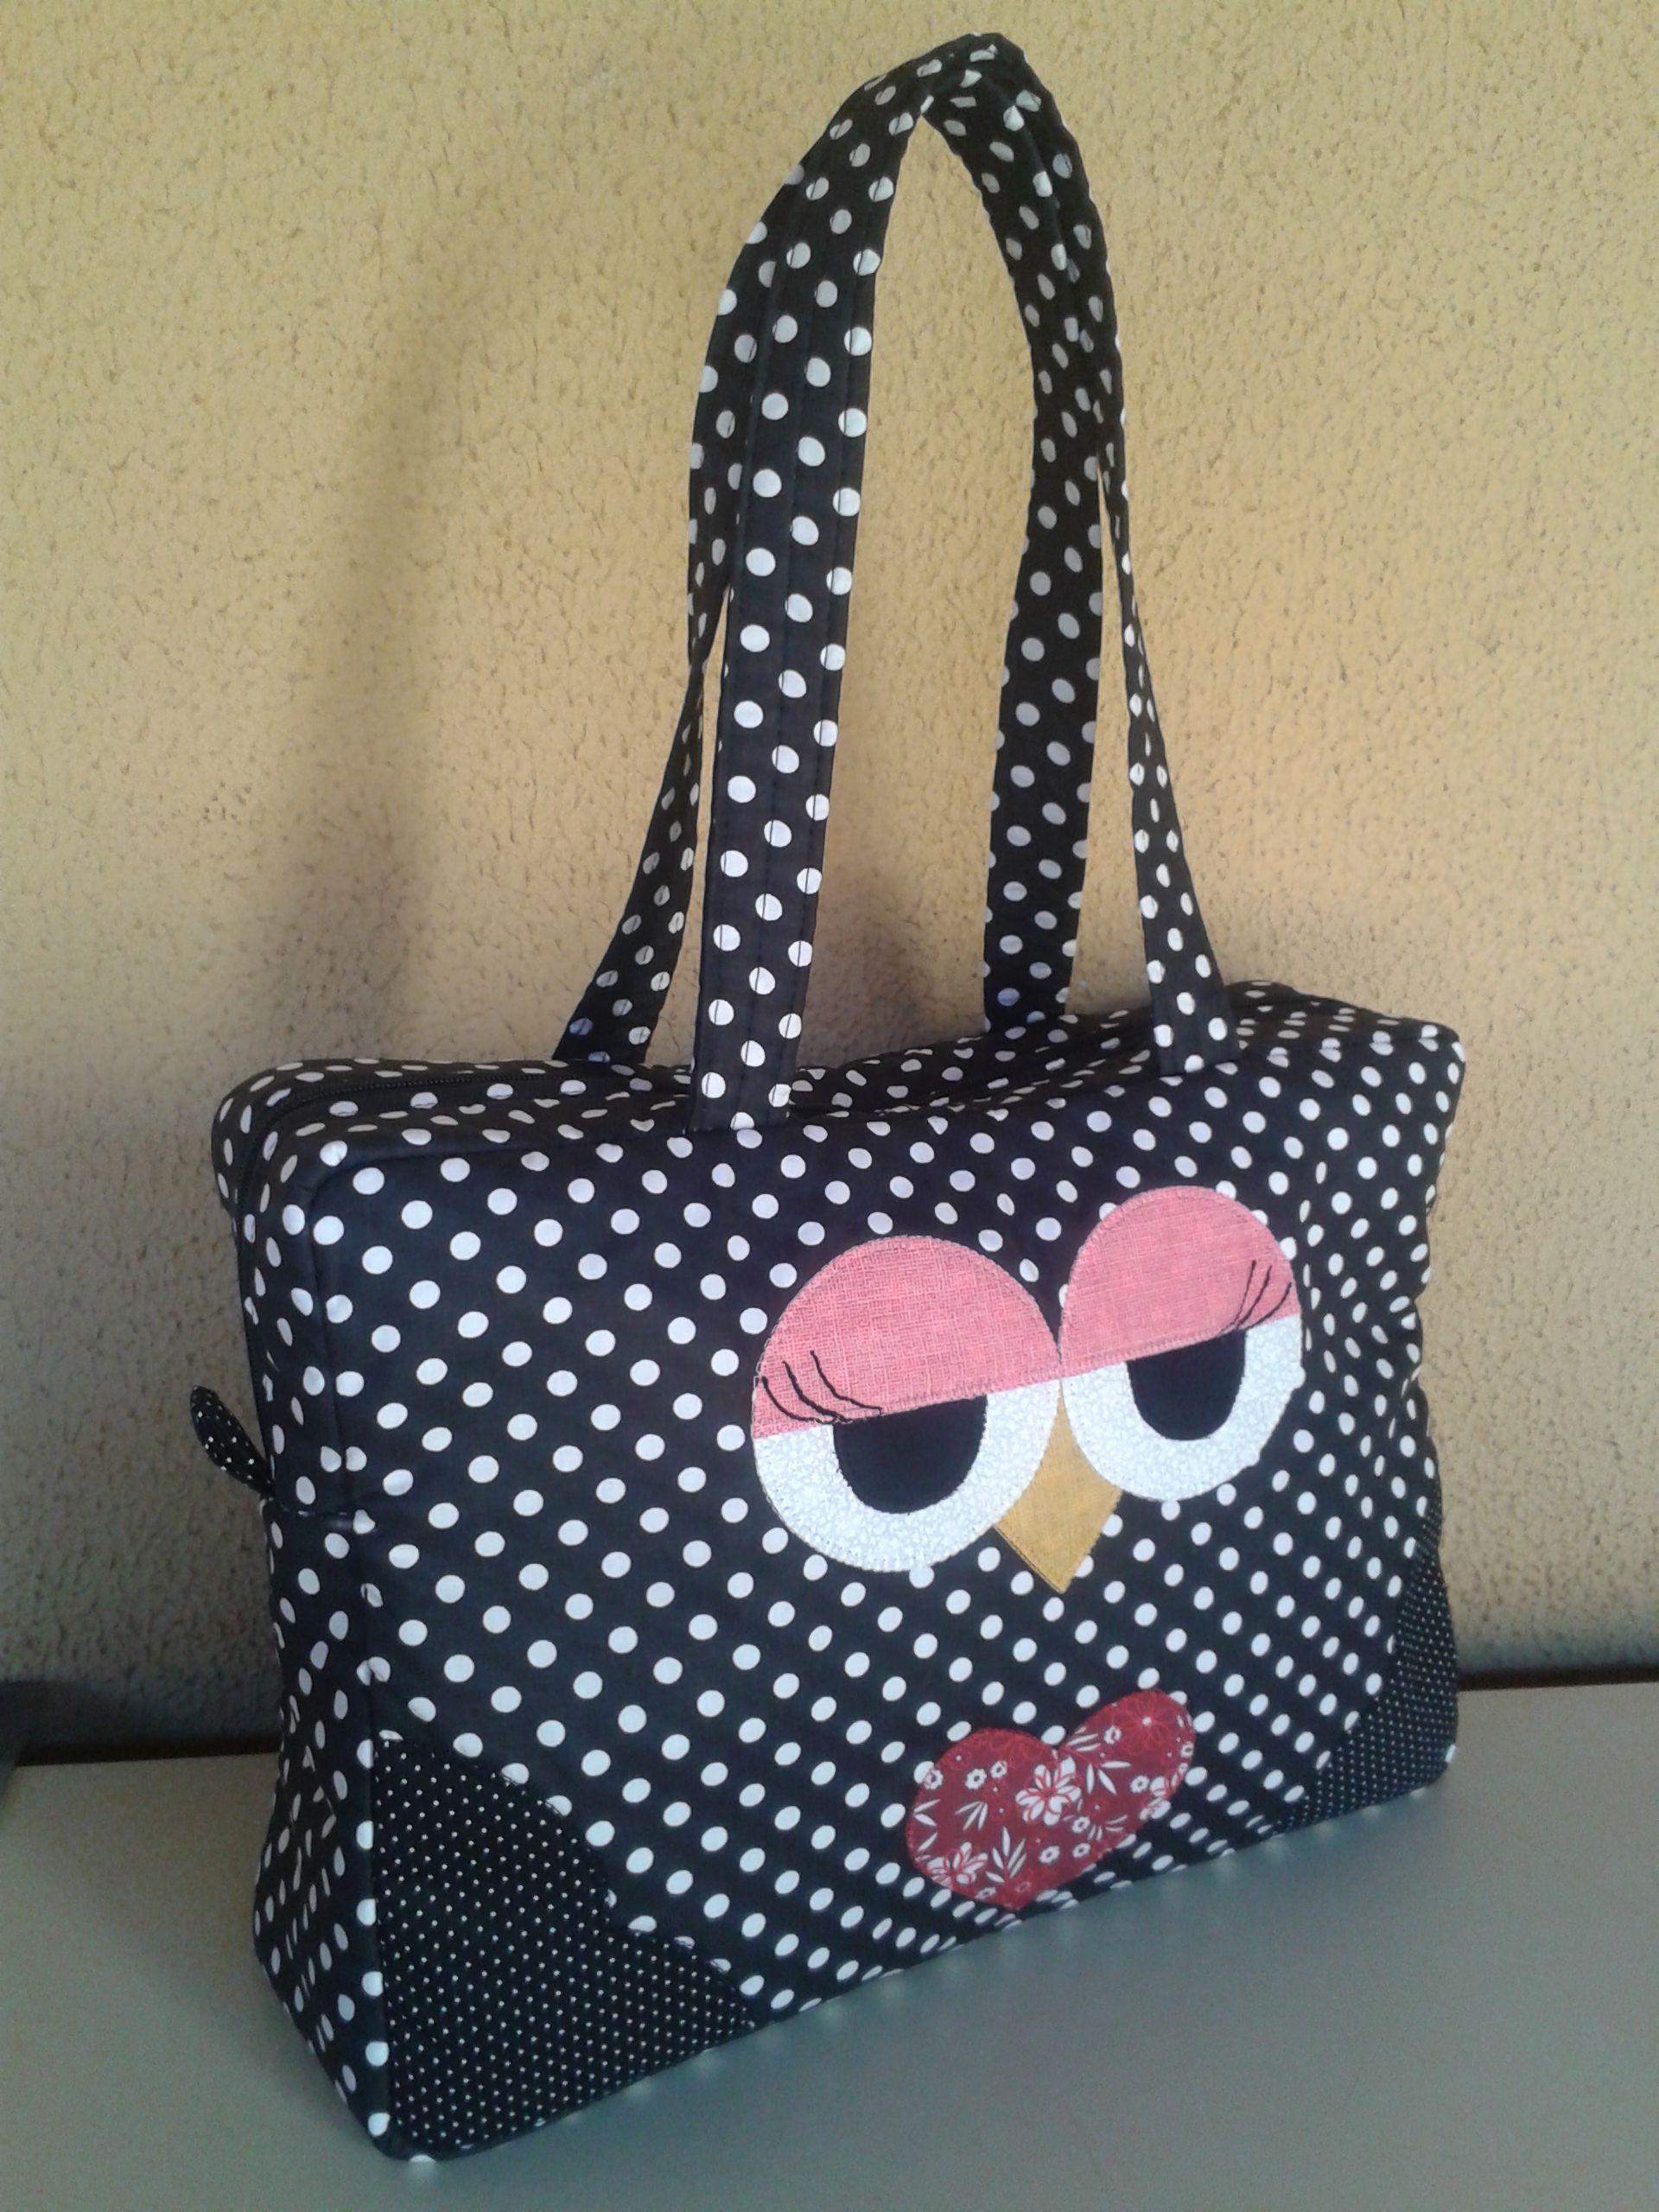 Bolsa De Tecido E Jeans : Bolsa de tecido cara coruja bolsas bag